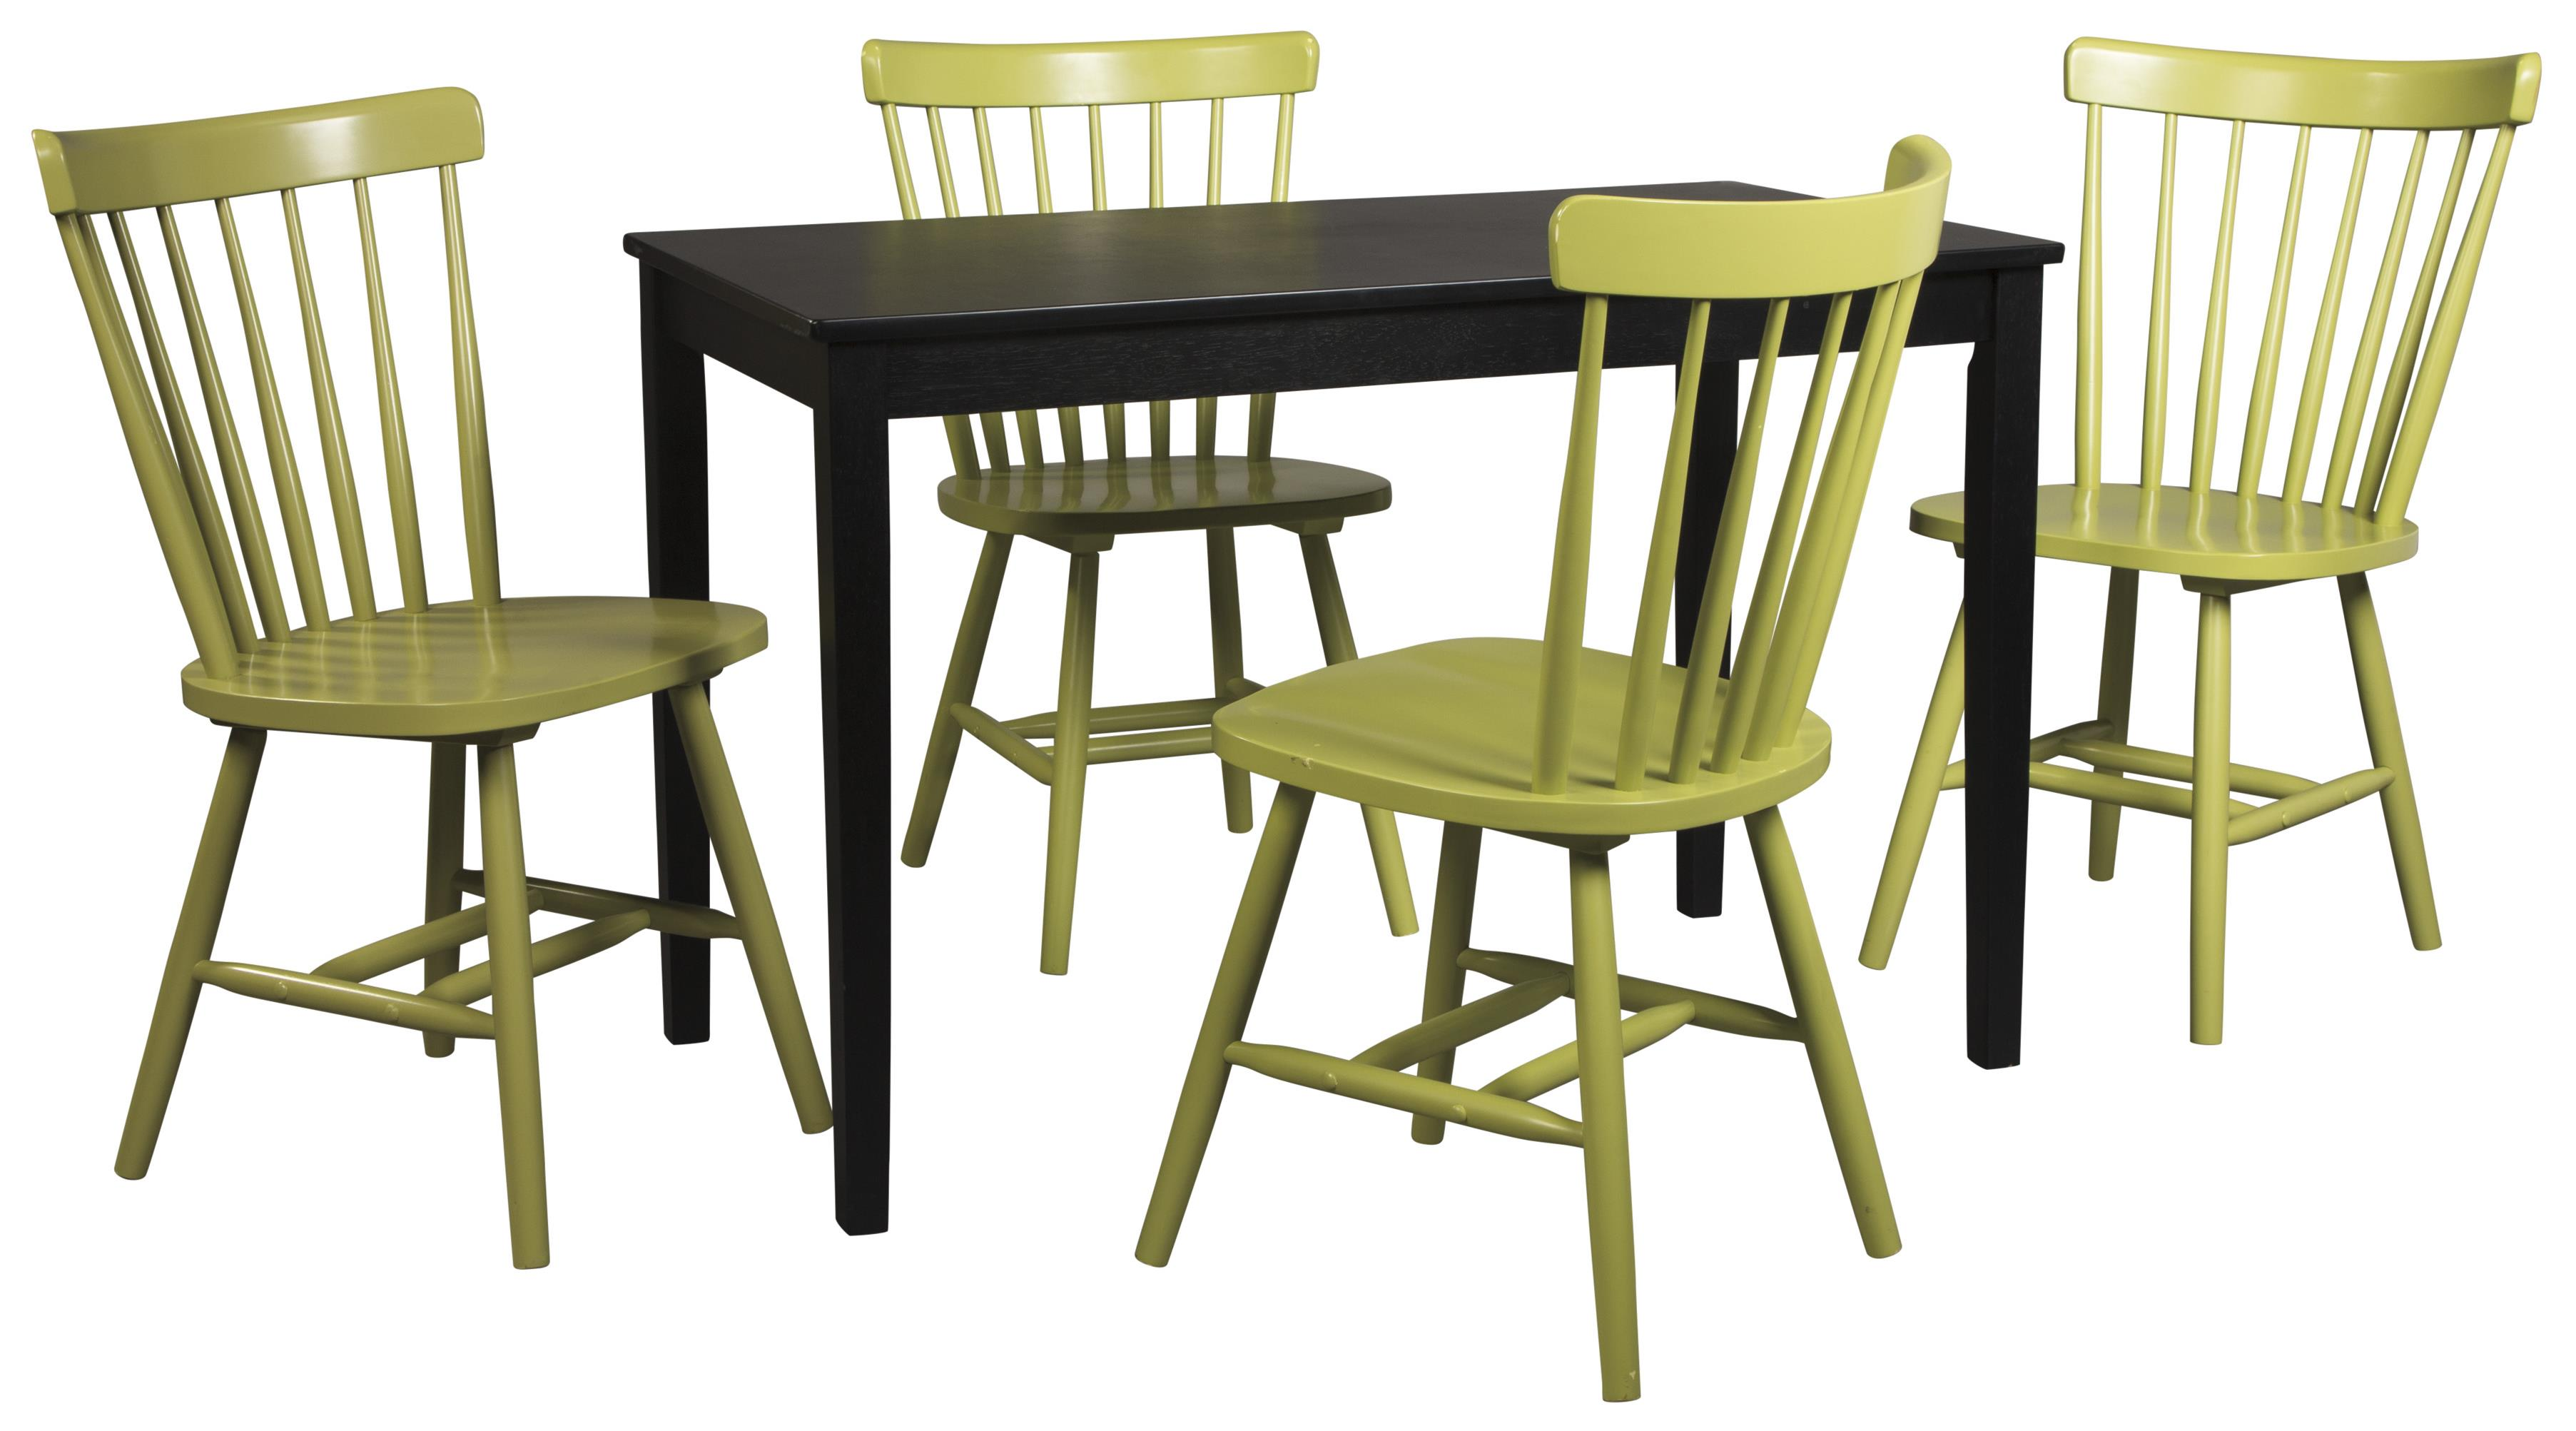 Signature Design by Ashley Kimonte 5-Piece Rectangular Table Set - Item Number: D250-25+4xD389-05